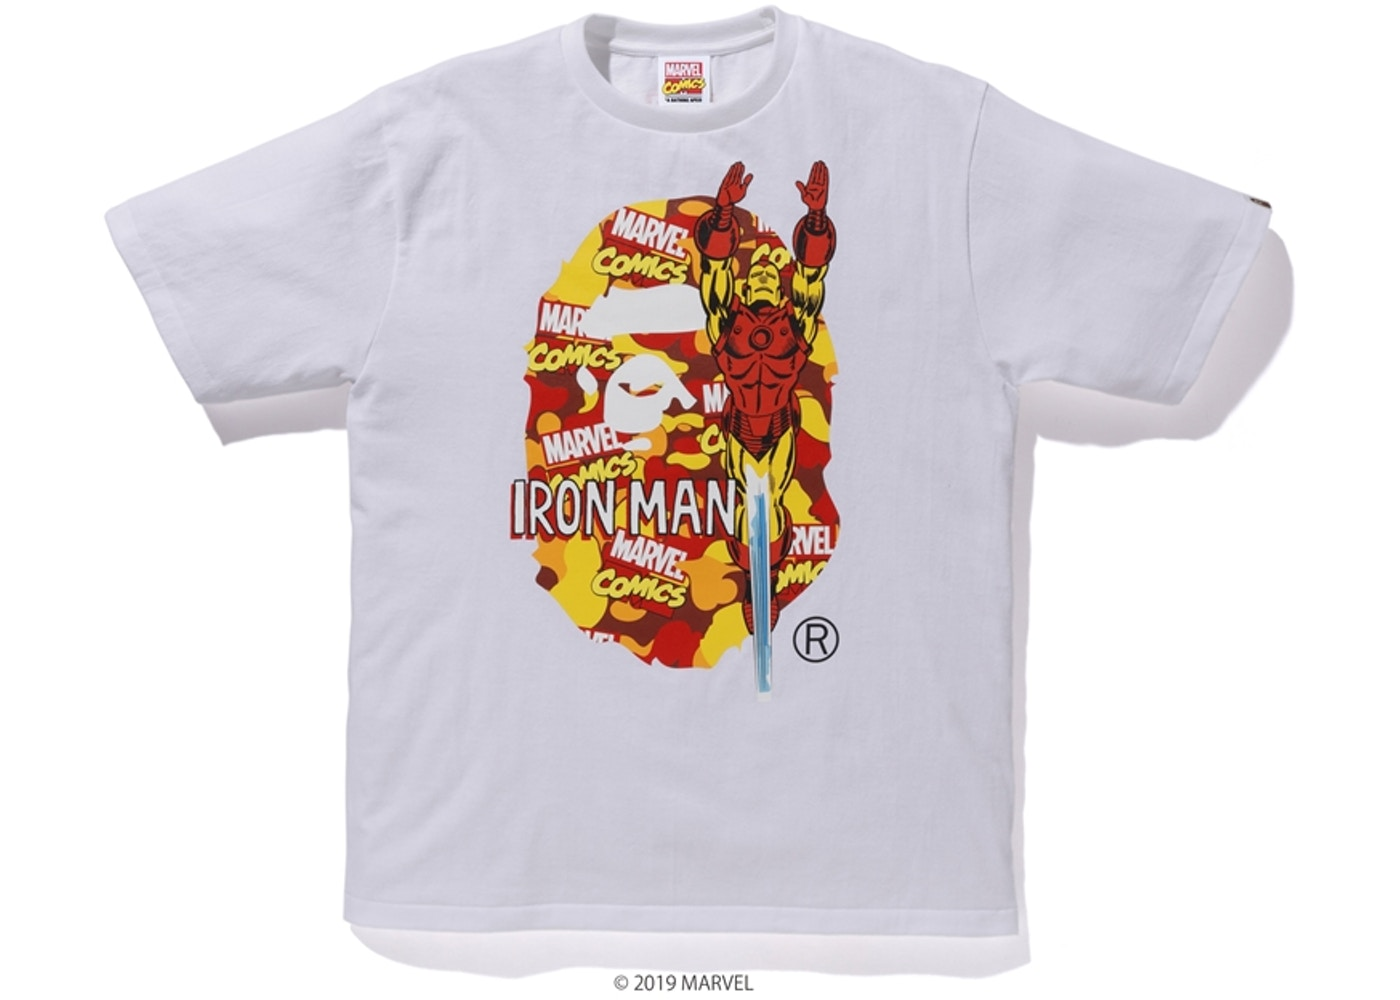 6e65a13a4 BAPE x Marvel Camo Iron Man Tee White - SS19